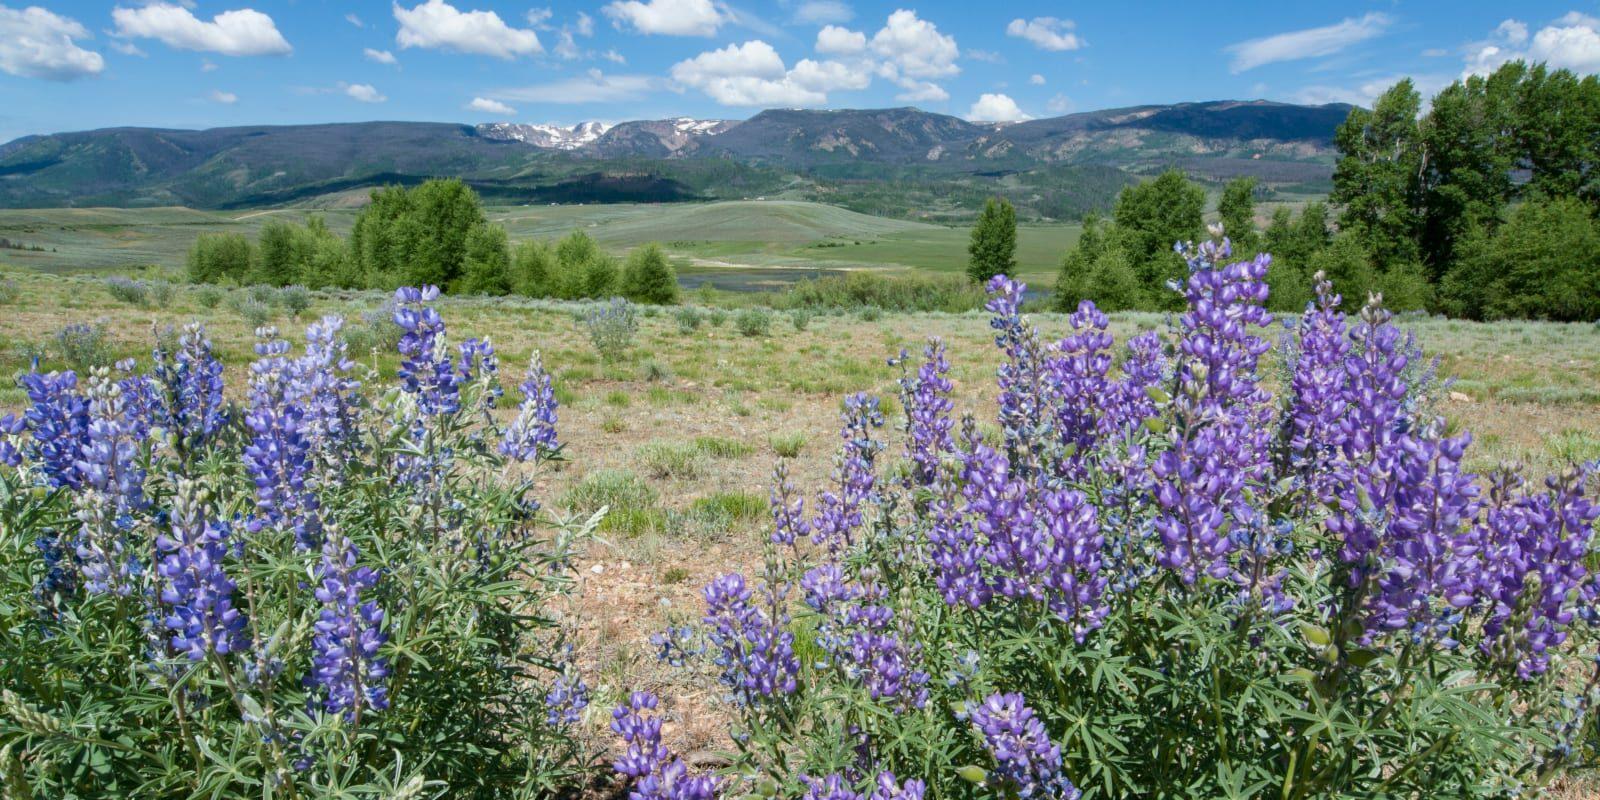 Mount Zirkel Wilderness Colorado Backpacking Wildflowers